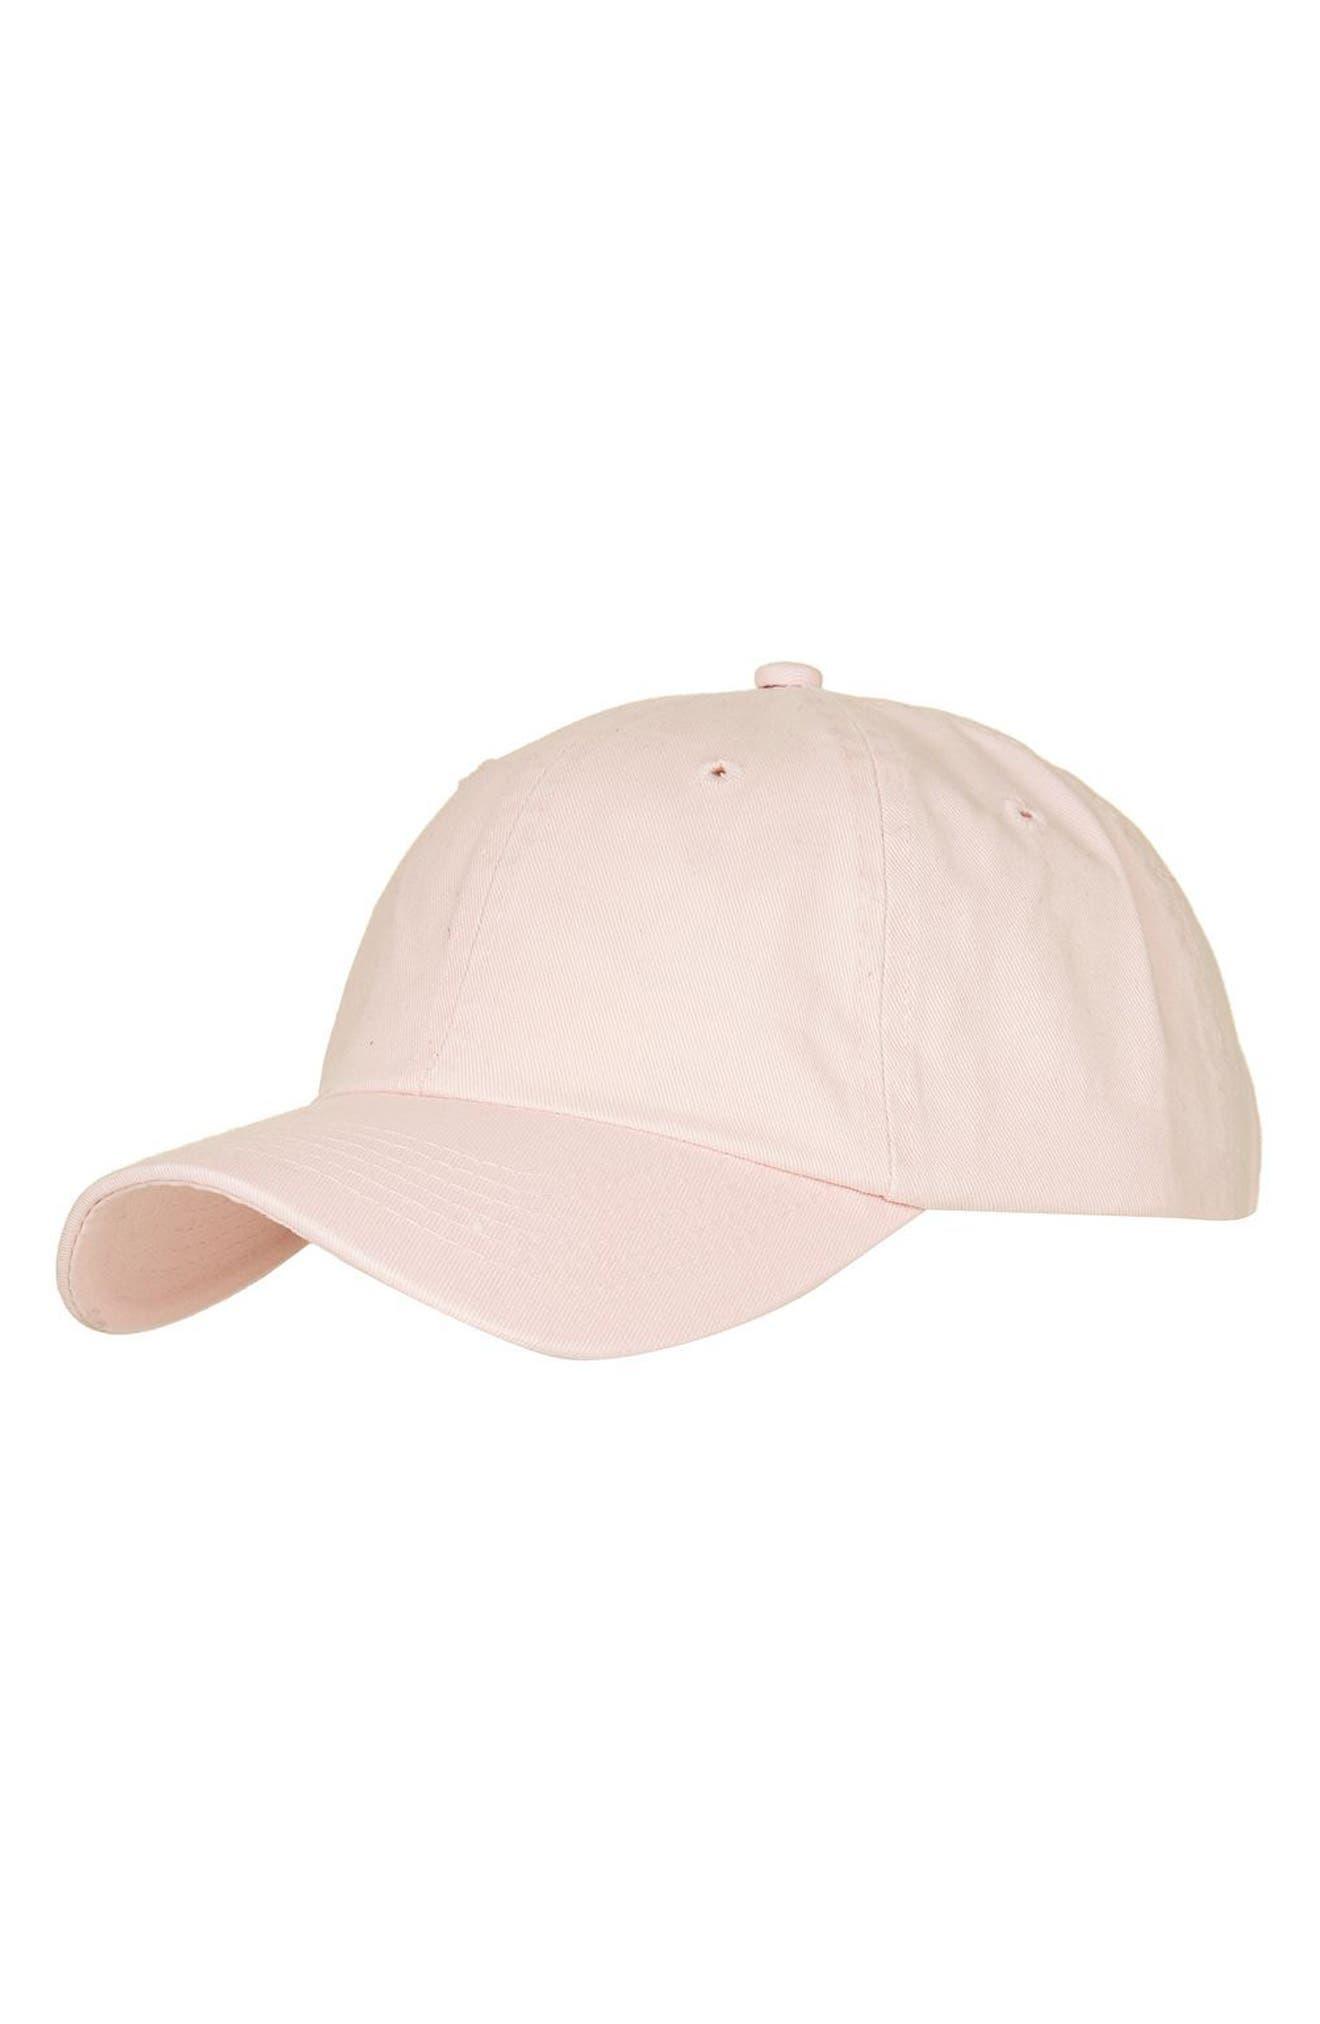 Alternate Image 1 Selected - Topshop Washed Baseball Cap